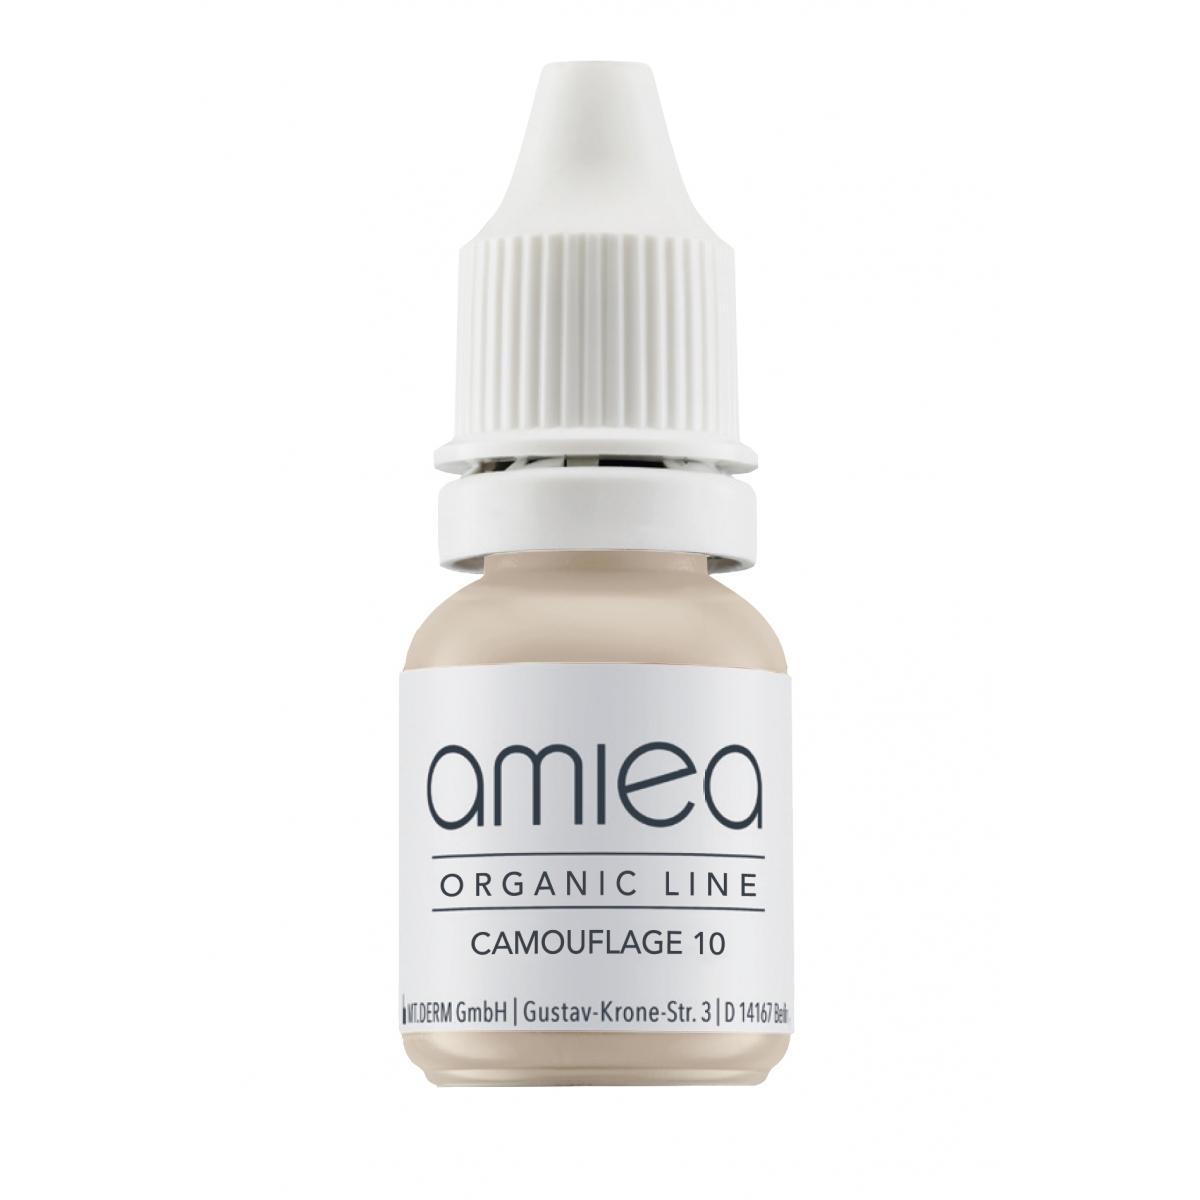 Organicline (5 ml)  - PIGMENTS AMIEA ORGANICLINE CAMOUFLAGE 10, Flacon 5 ml